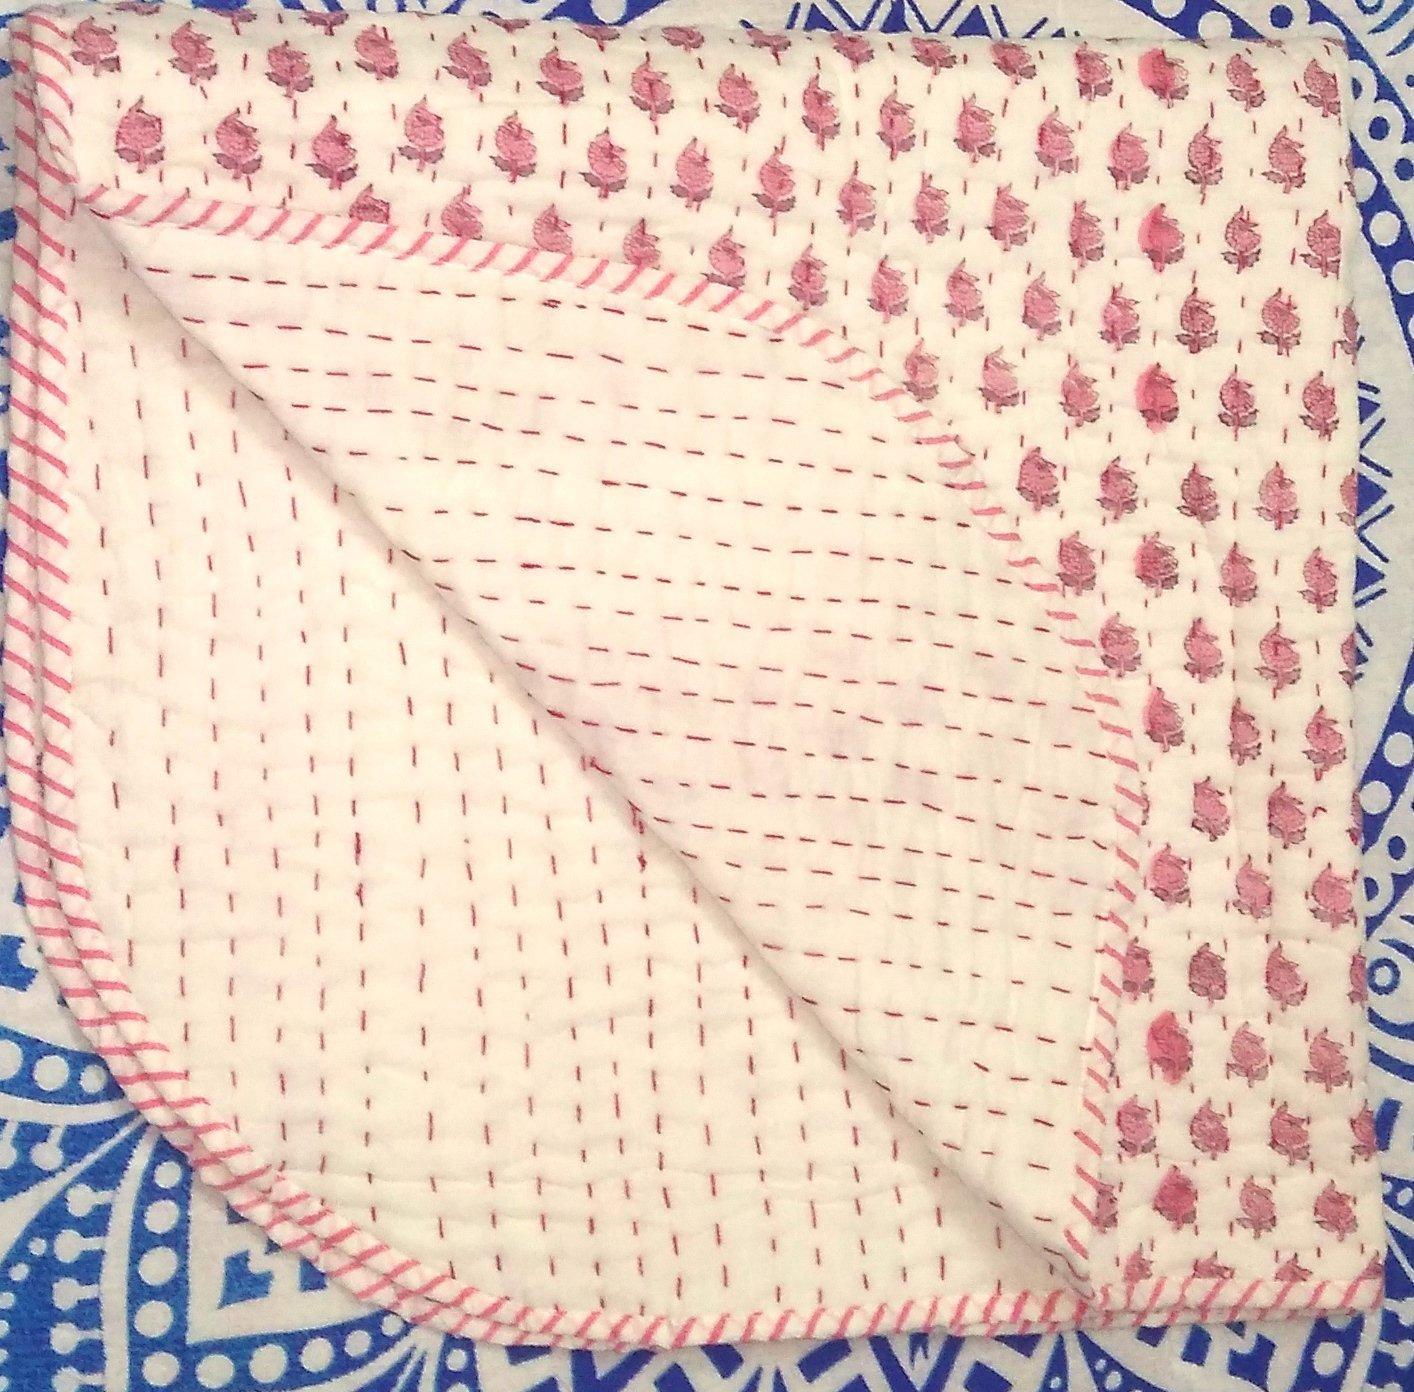 Indian Block Print Fabric Baby Quilt, Kantha Throw, Cotton Fabric Kids Bedding, Bohemian Bedspread